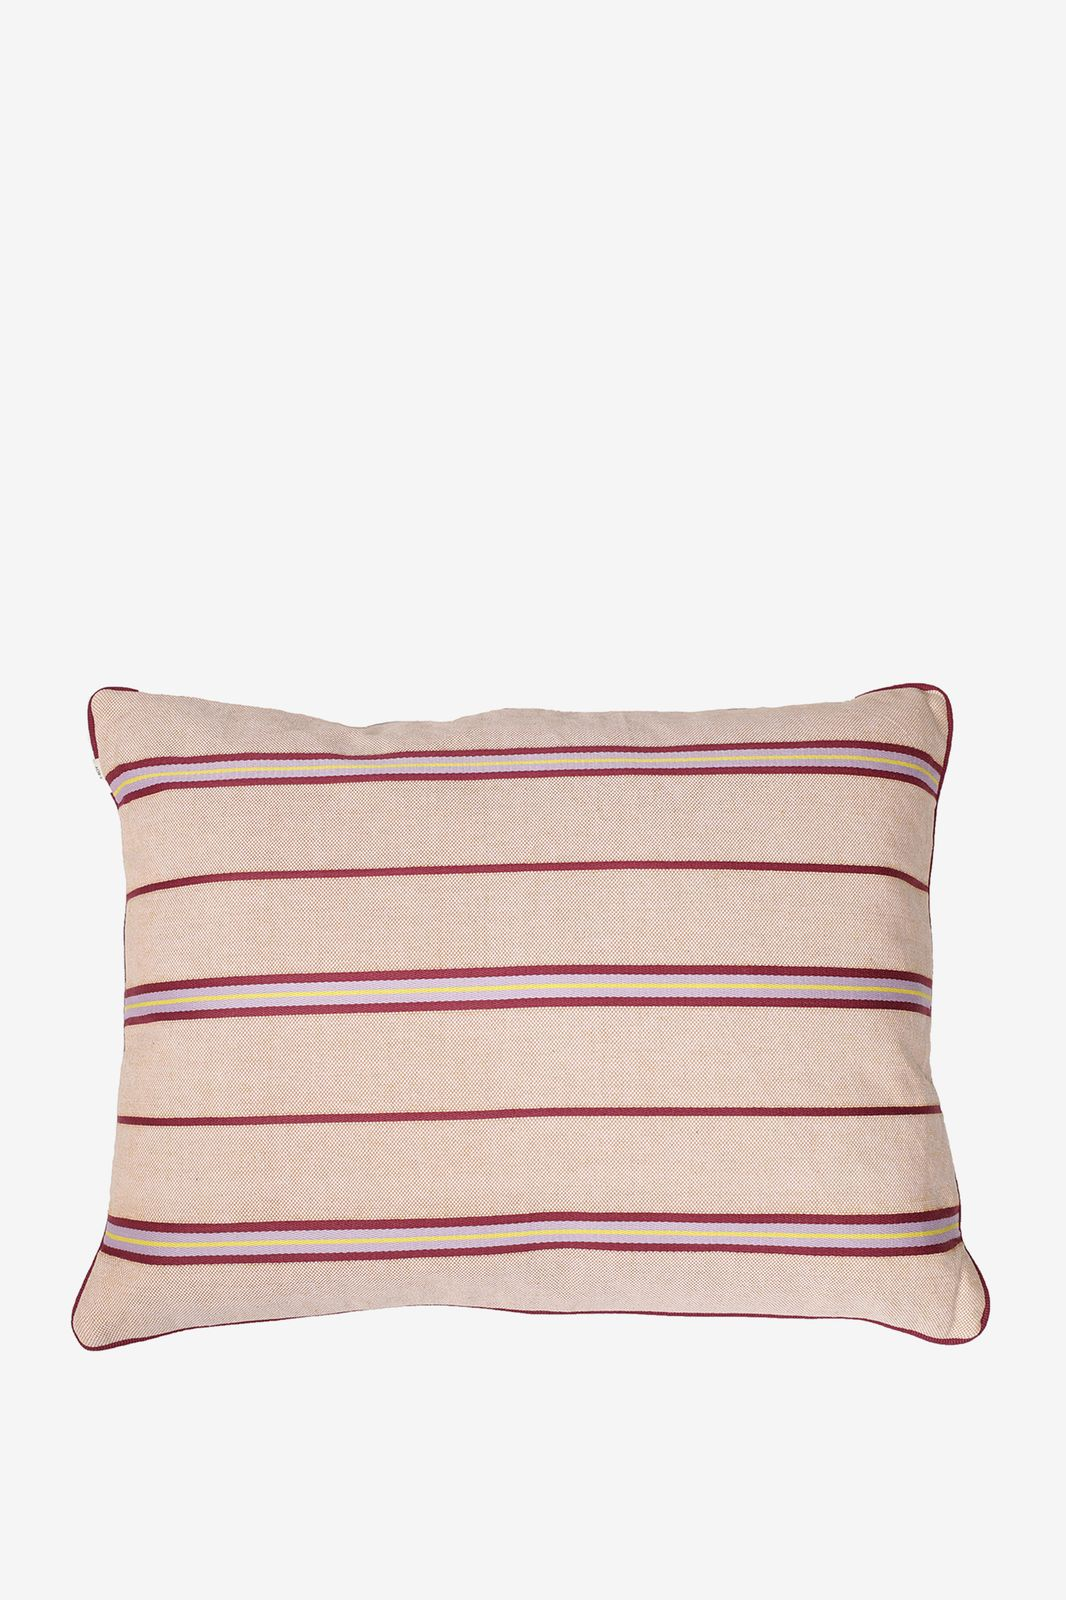 Roze sierkussen met horizontale strepen - Homeland | Sissy-Boy